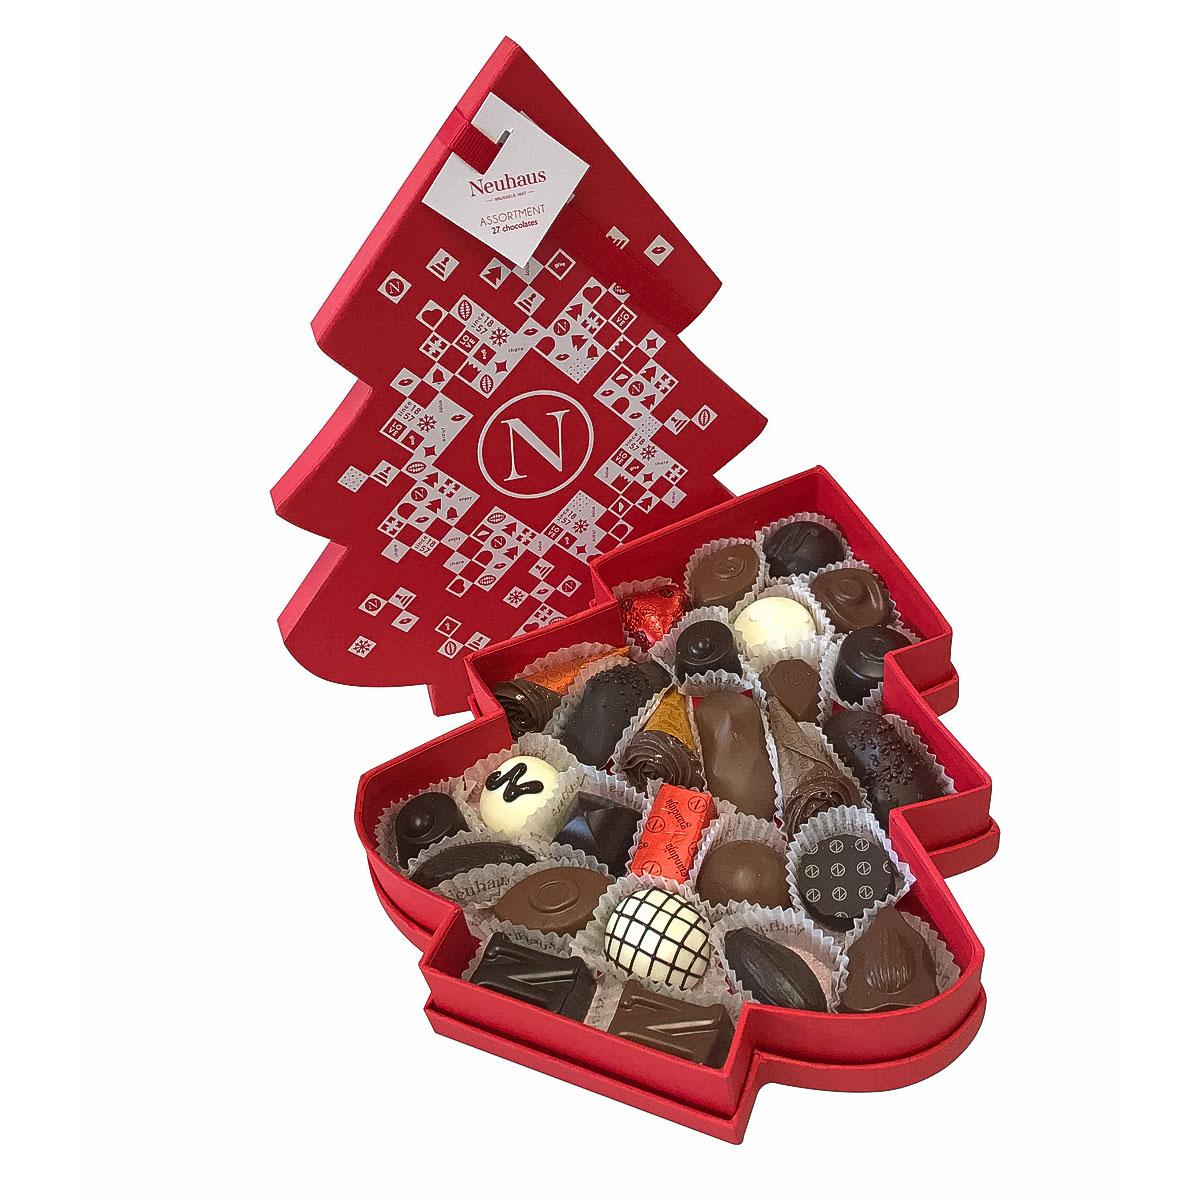 Christmas Ideas Secret Santa: 30 Secret Santa Gifts Ideas For Christmas